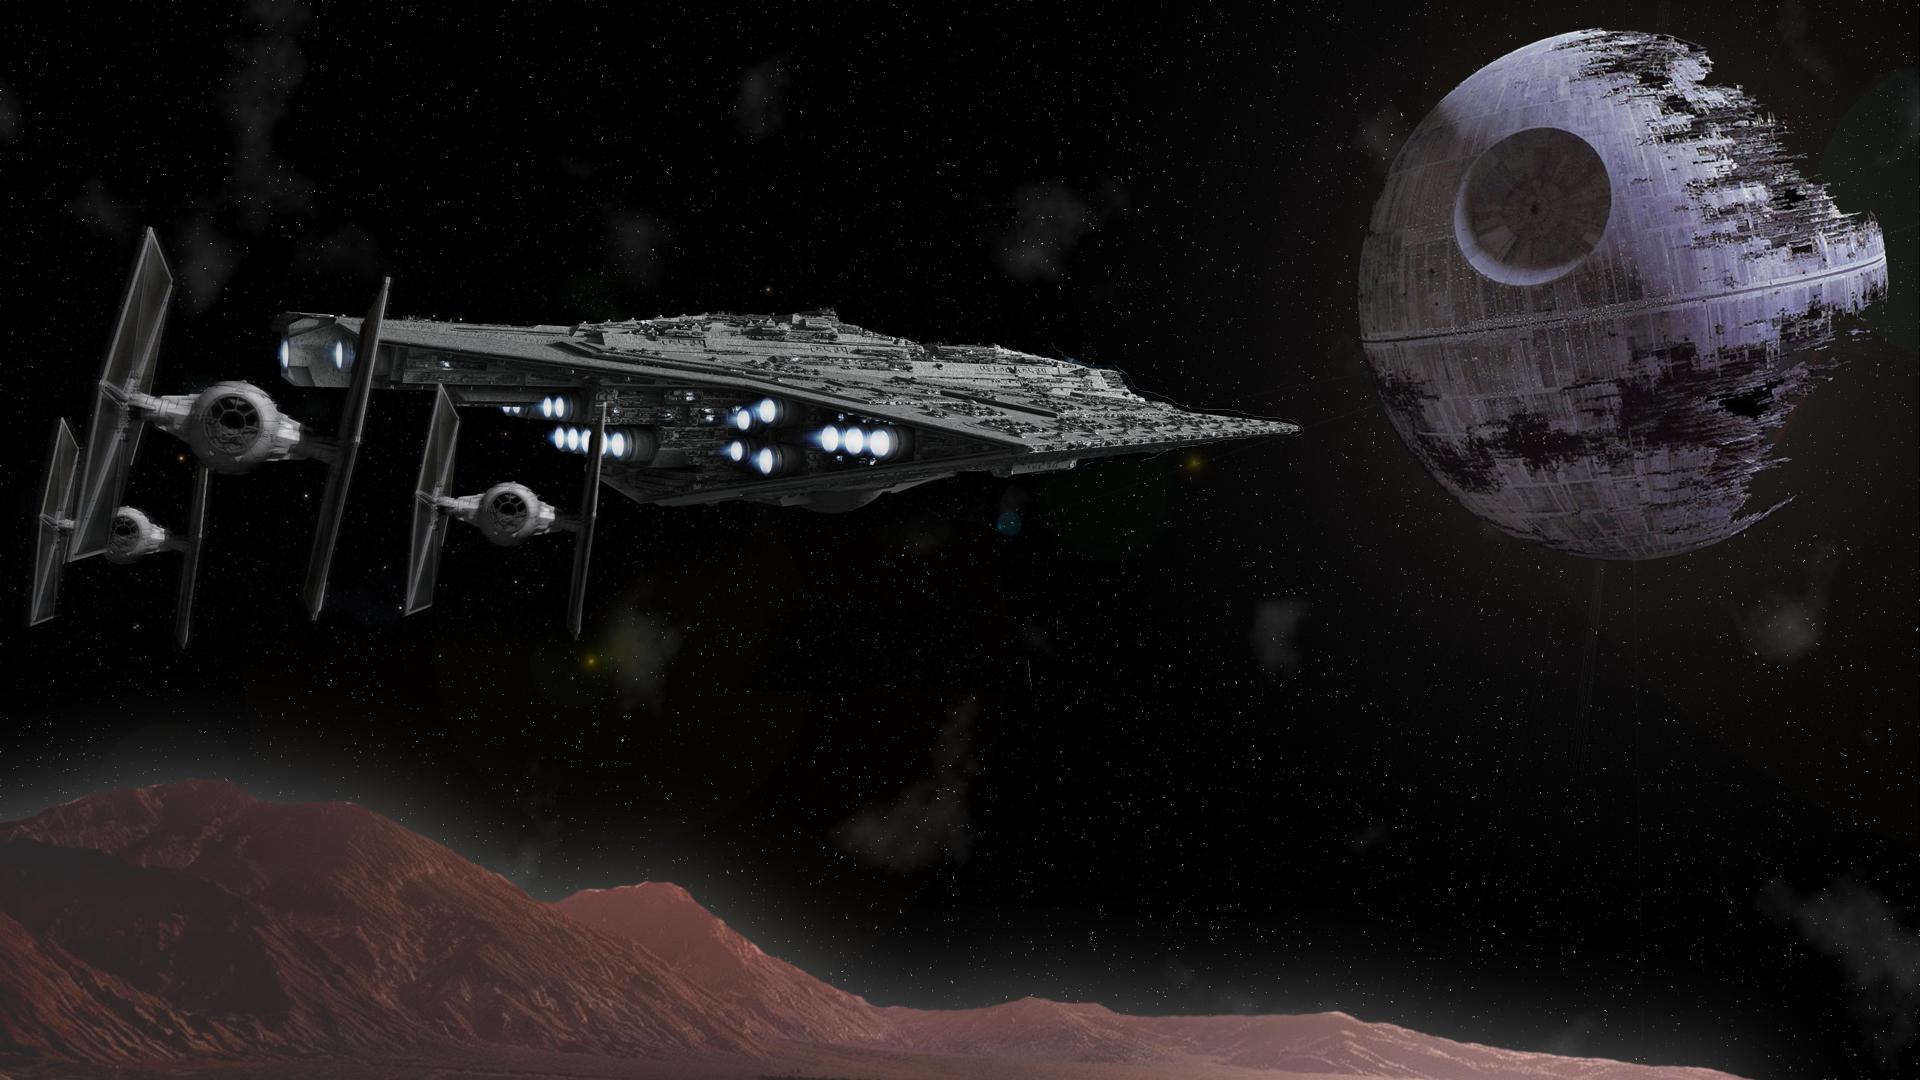 Wallpaper Spaceship Star Wars Tie Fighter Death Star 1920x1080 Deltaprime 1156428 Hd Wallpapers Wallhere